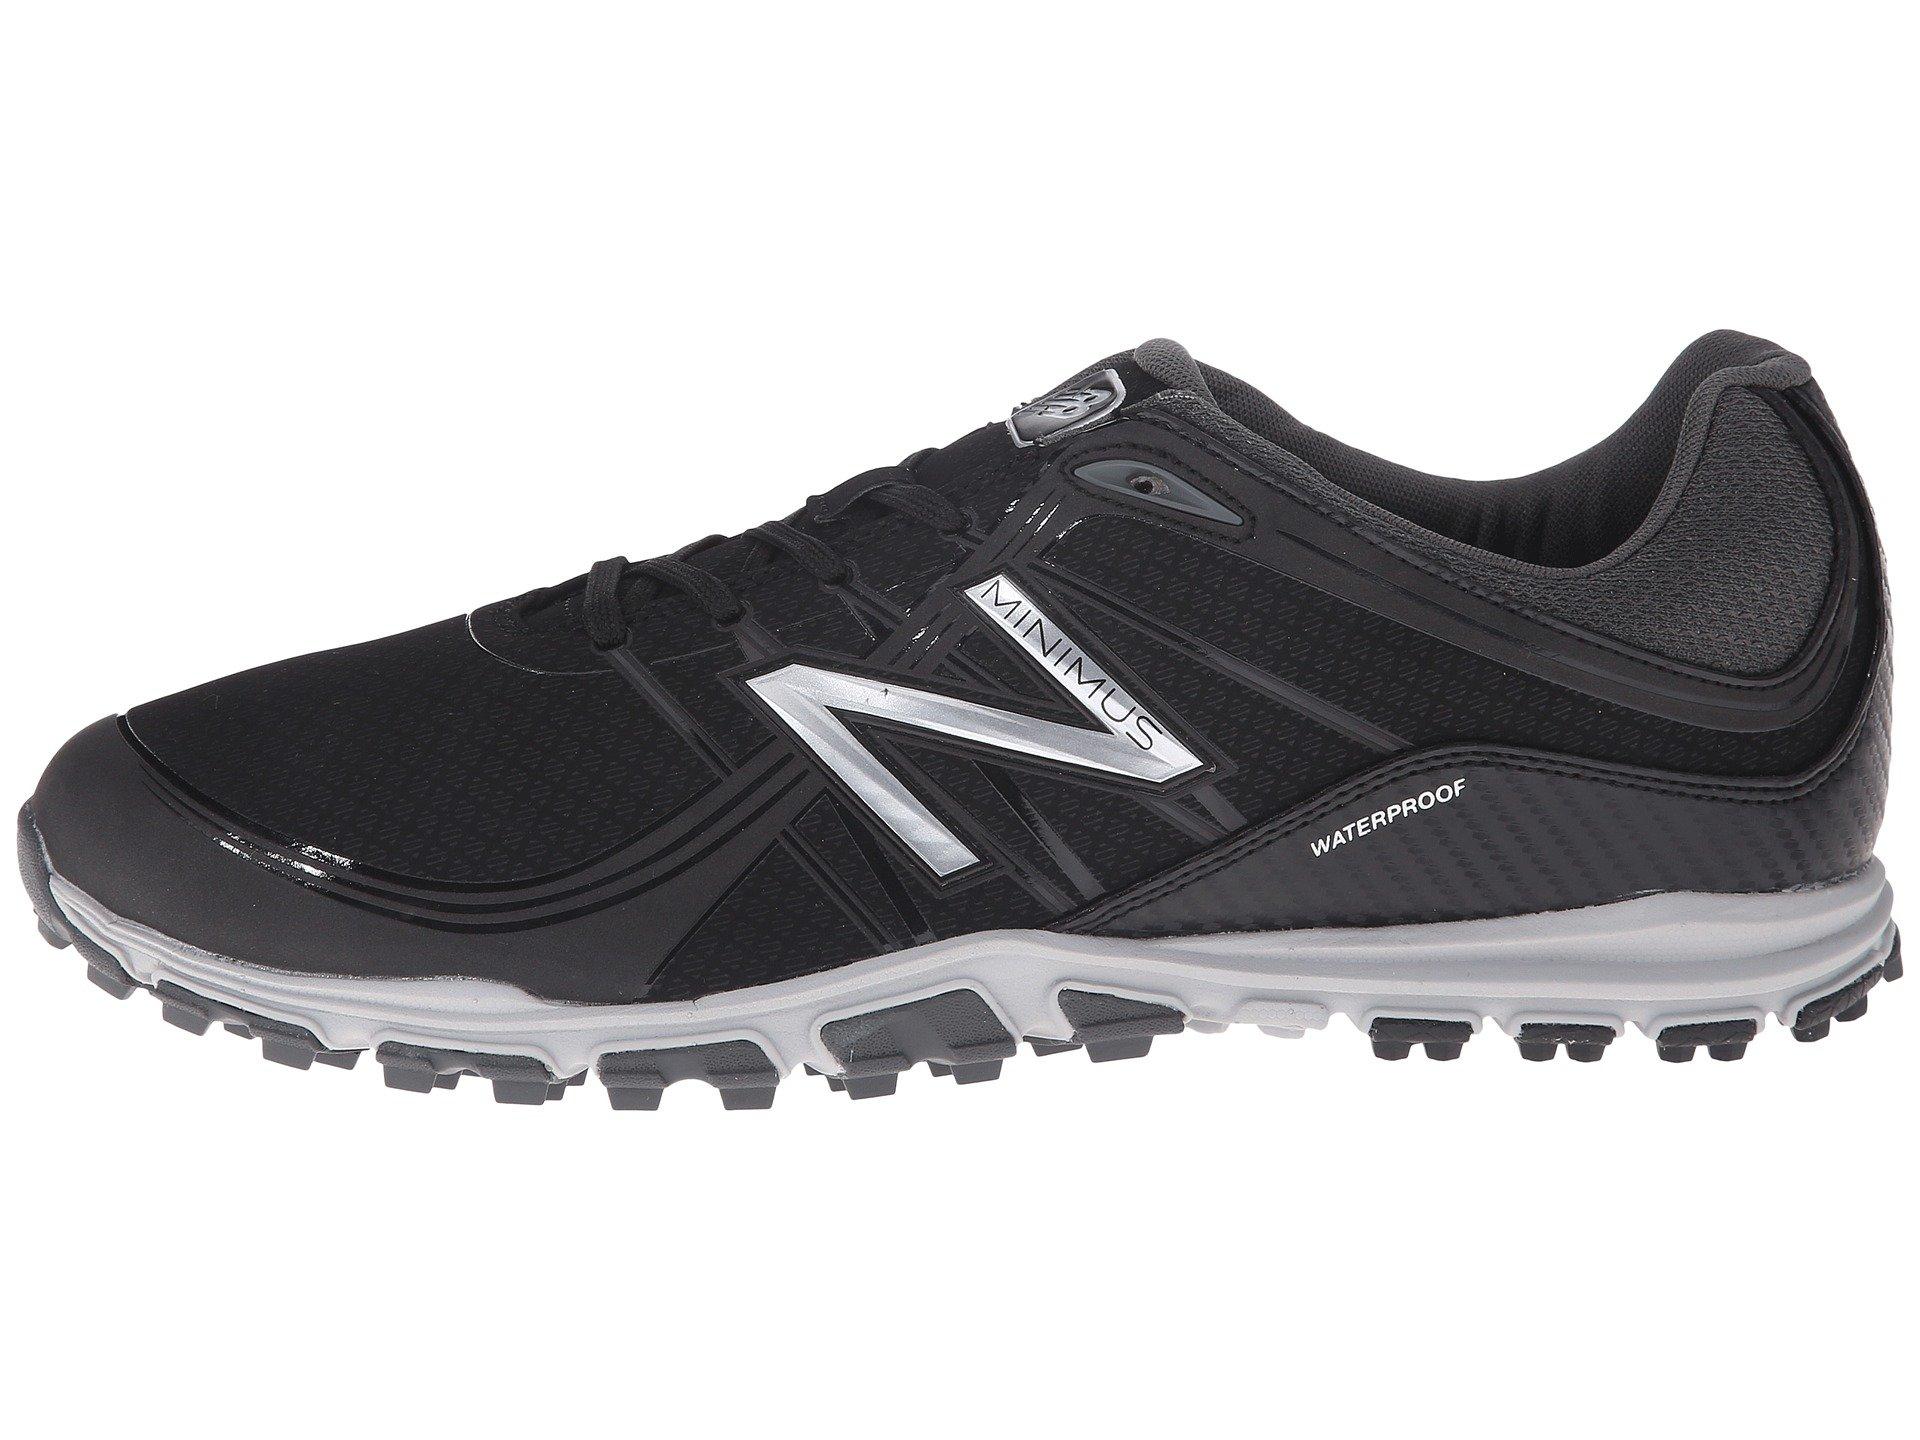 New Balance E Wide Golf Shoes